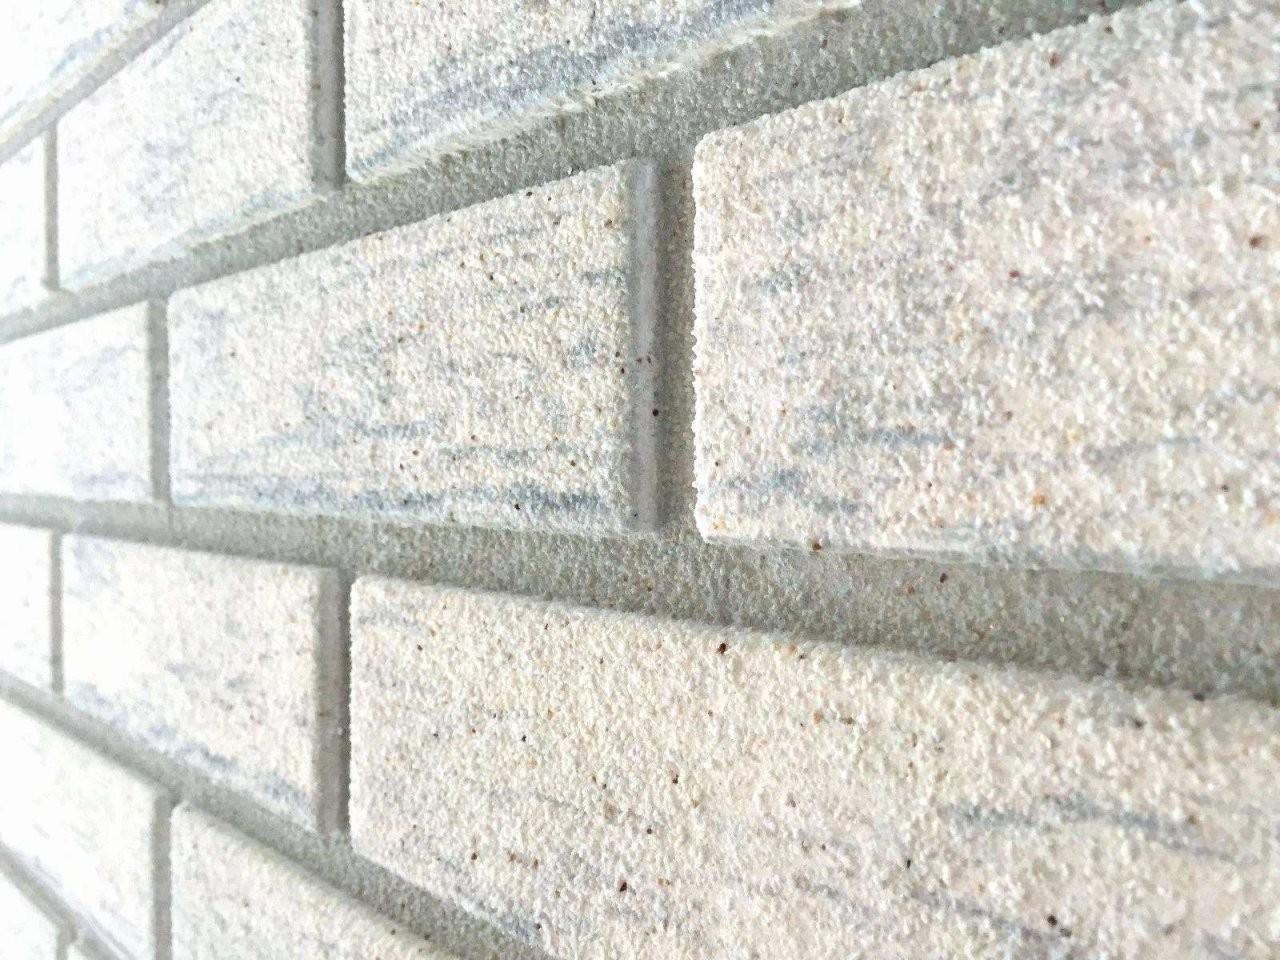 Wandverkleidung Kunststoff Innen Neu 17 Originell Steinoptik von Wandverkleidung Steinoptik Innen Kunststoff Photo